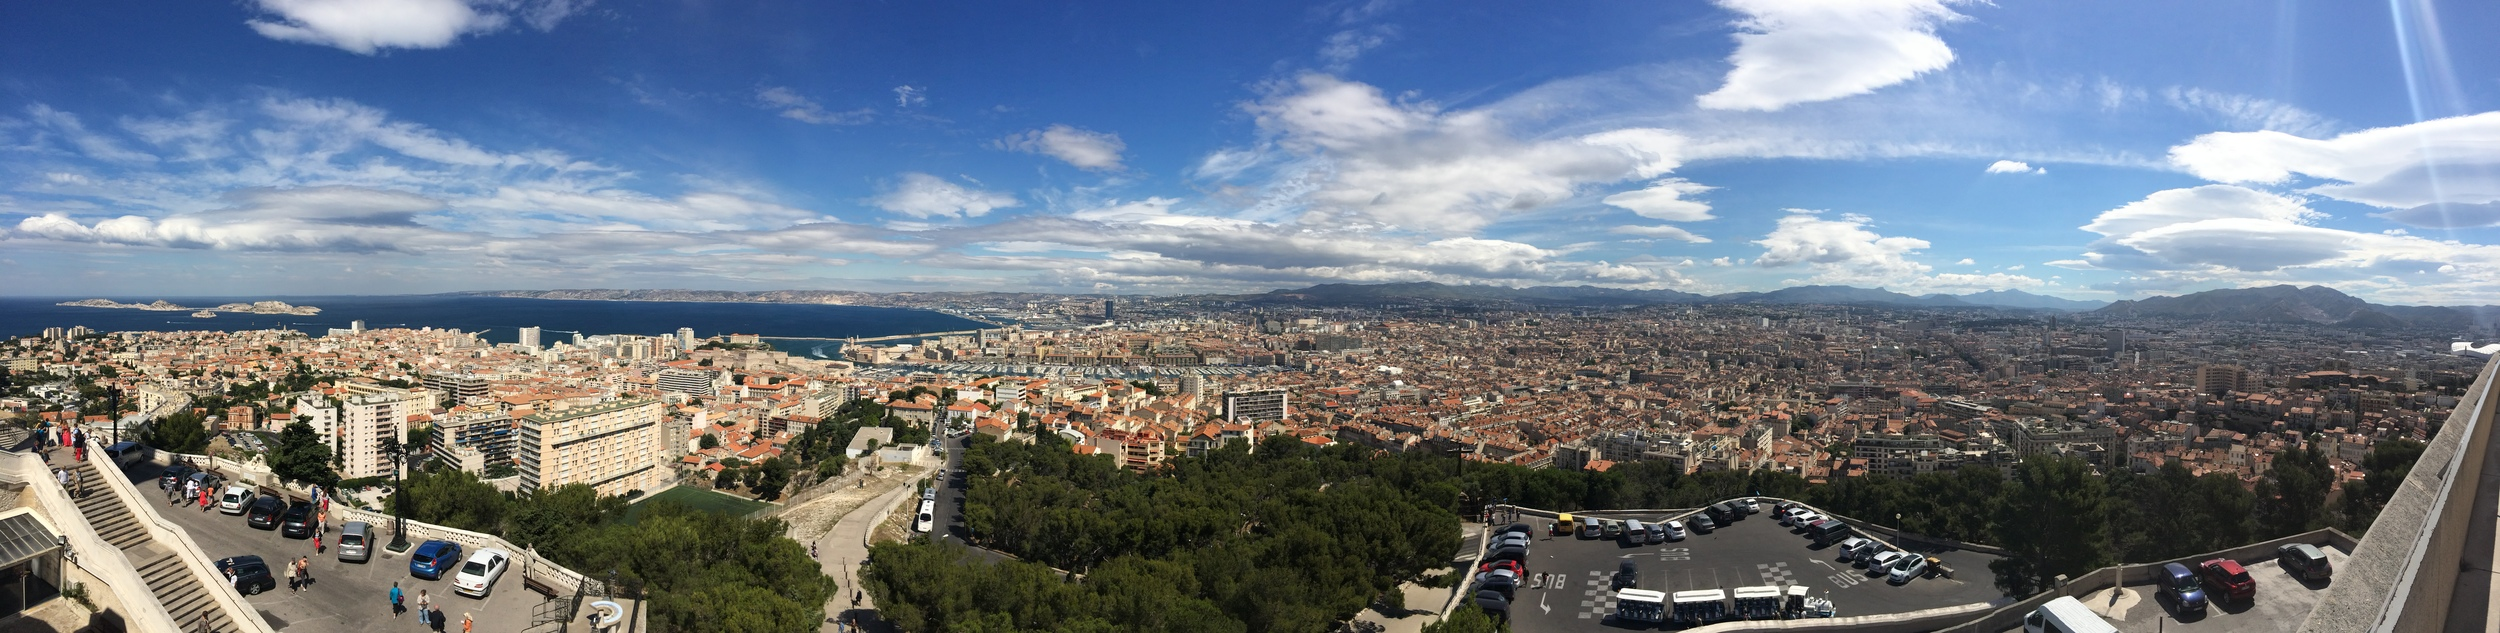 View from the top of Marseille next toNotre-Dame de la Garde.